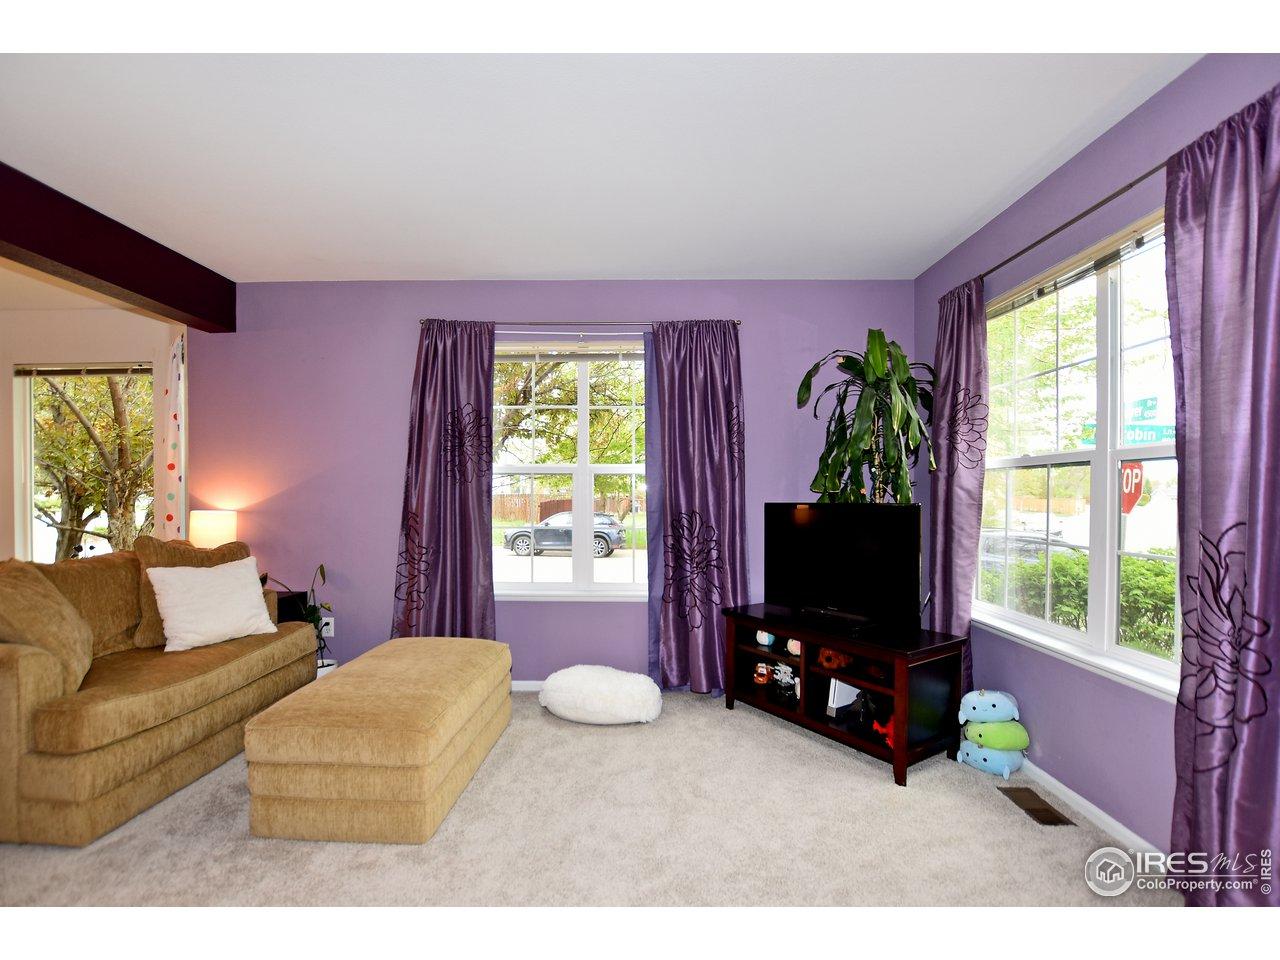 Great natural light illuminates the living room.